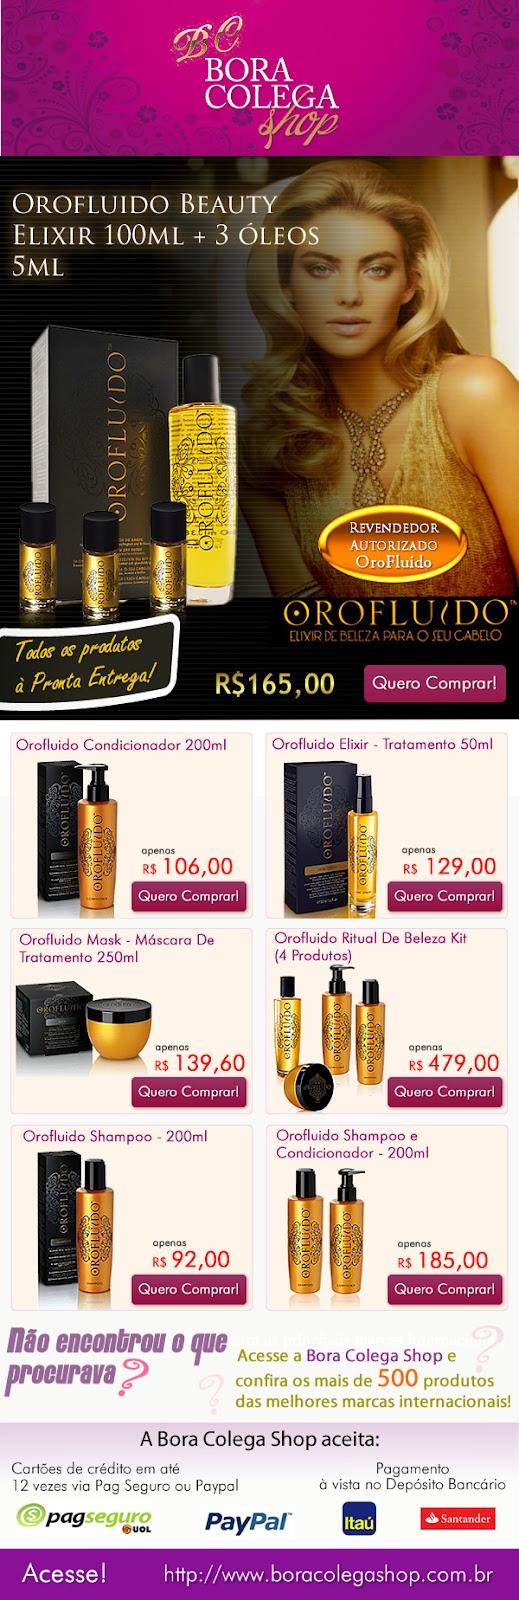 http://boracolegashop.webstorelw.com.br/